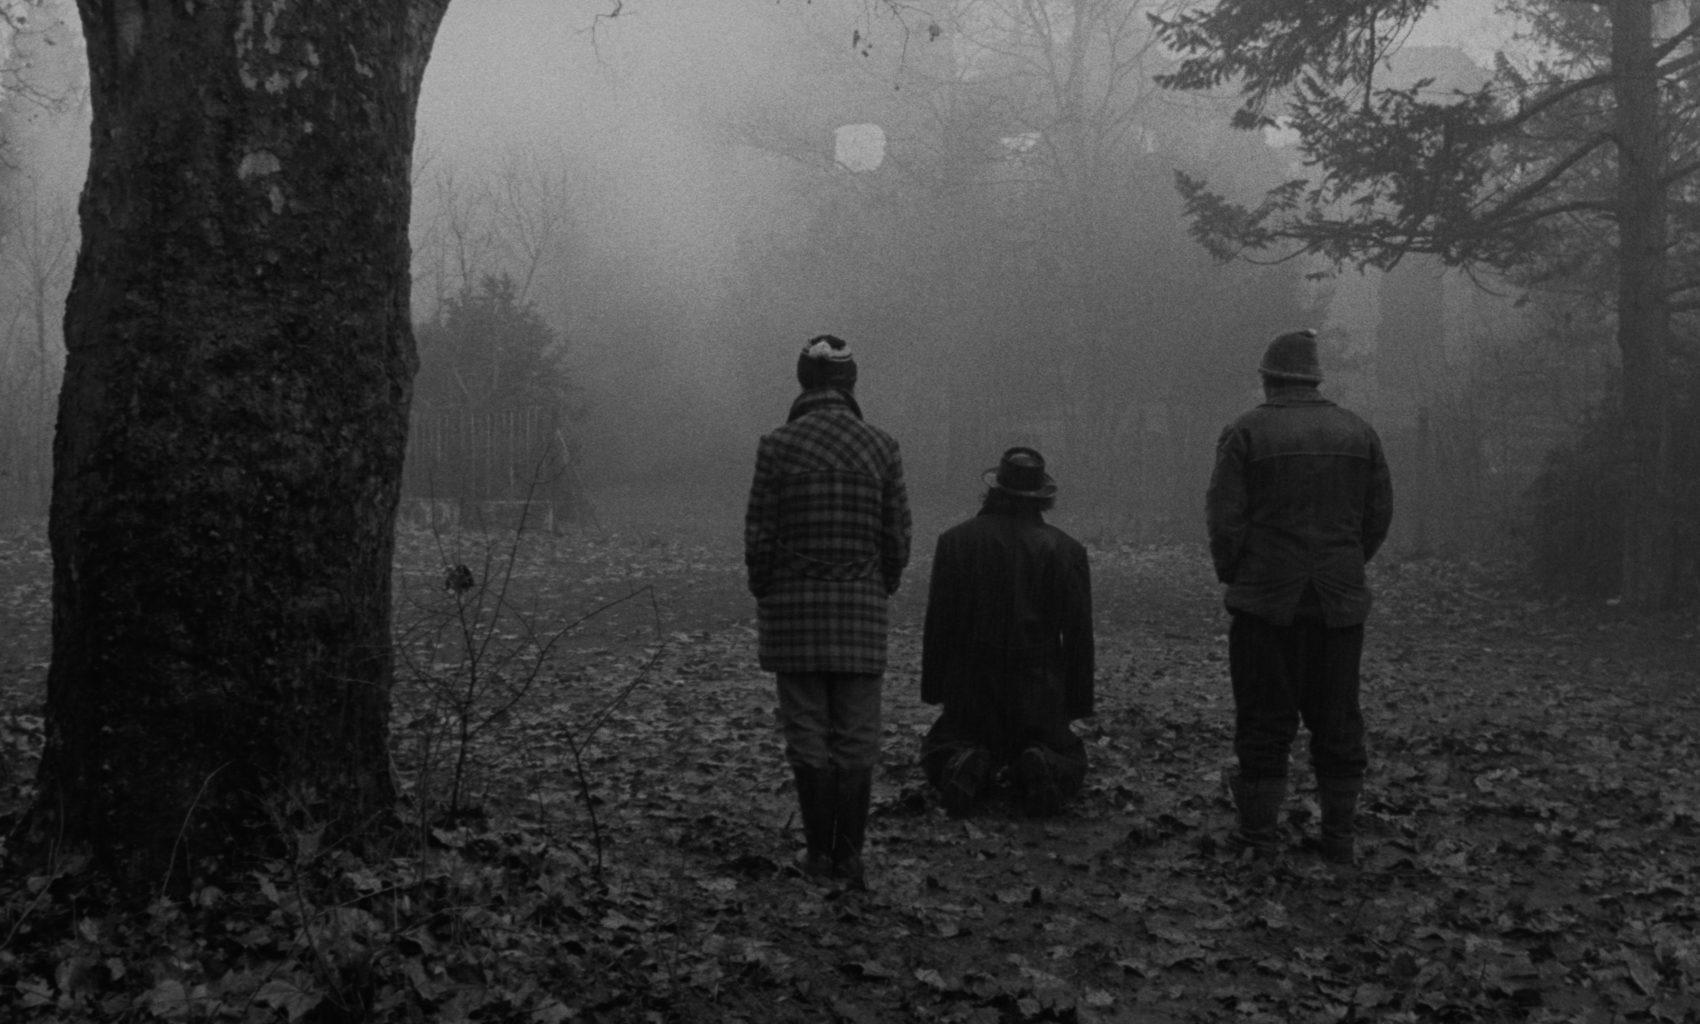 Sátántangó (Hungary, 1994, Béla Tarr)